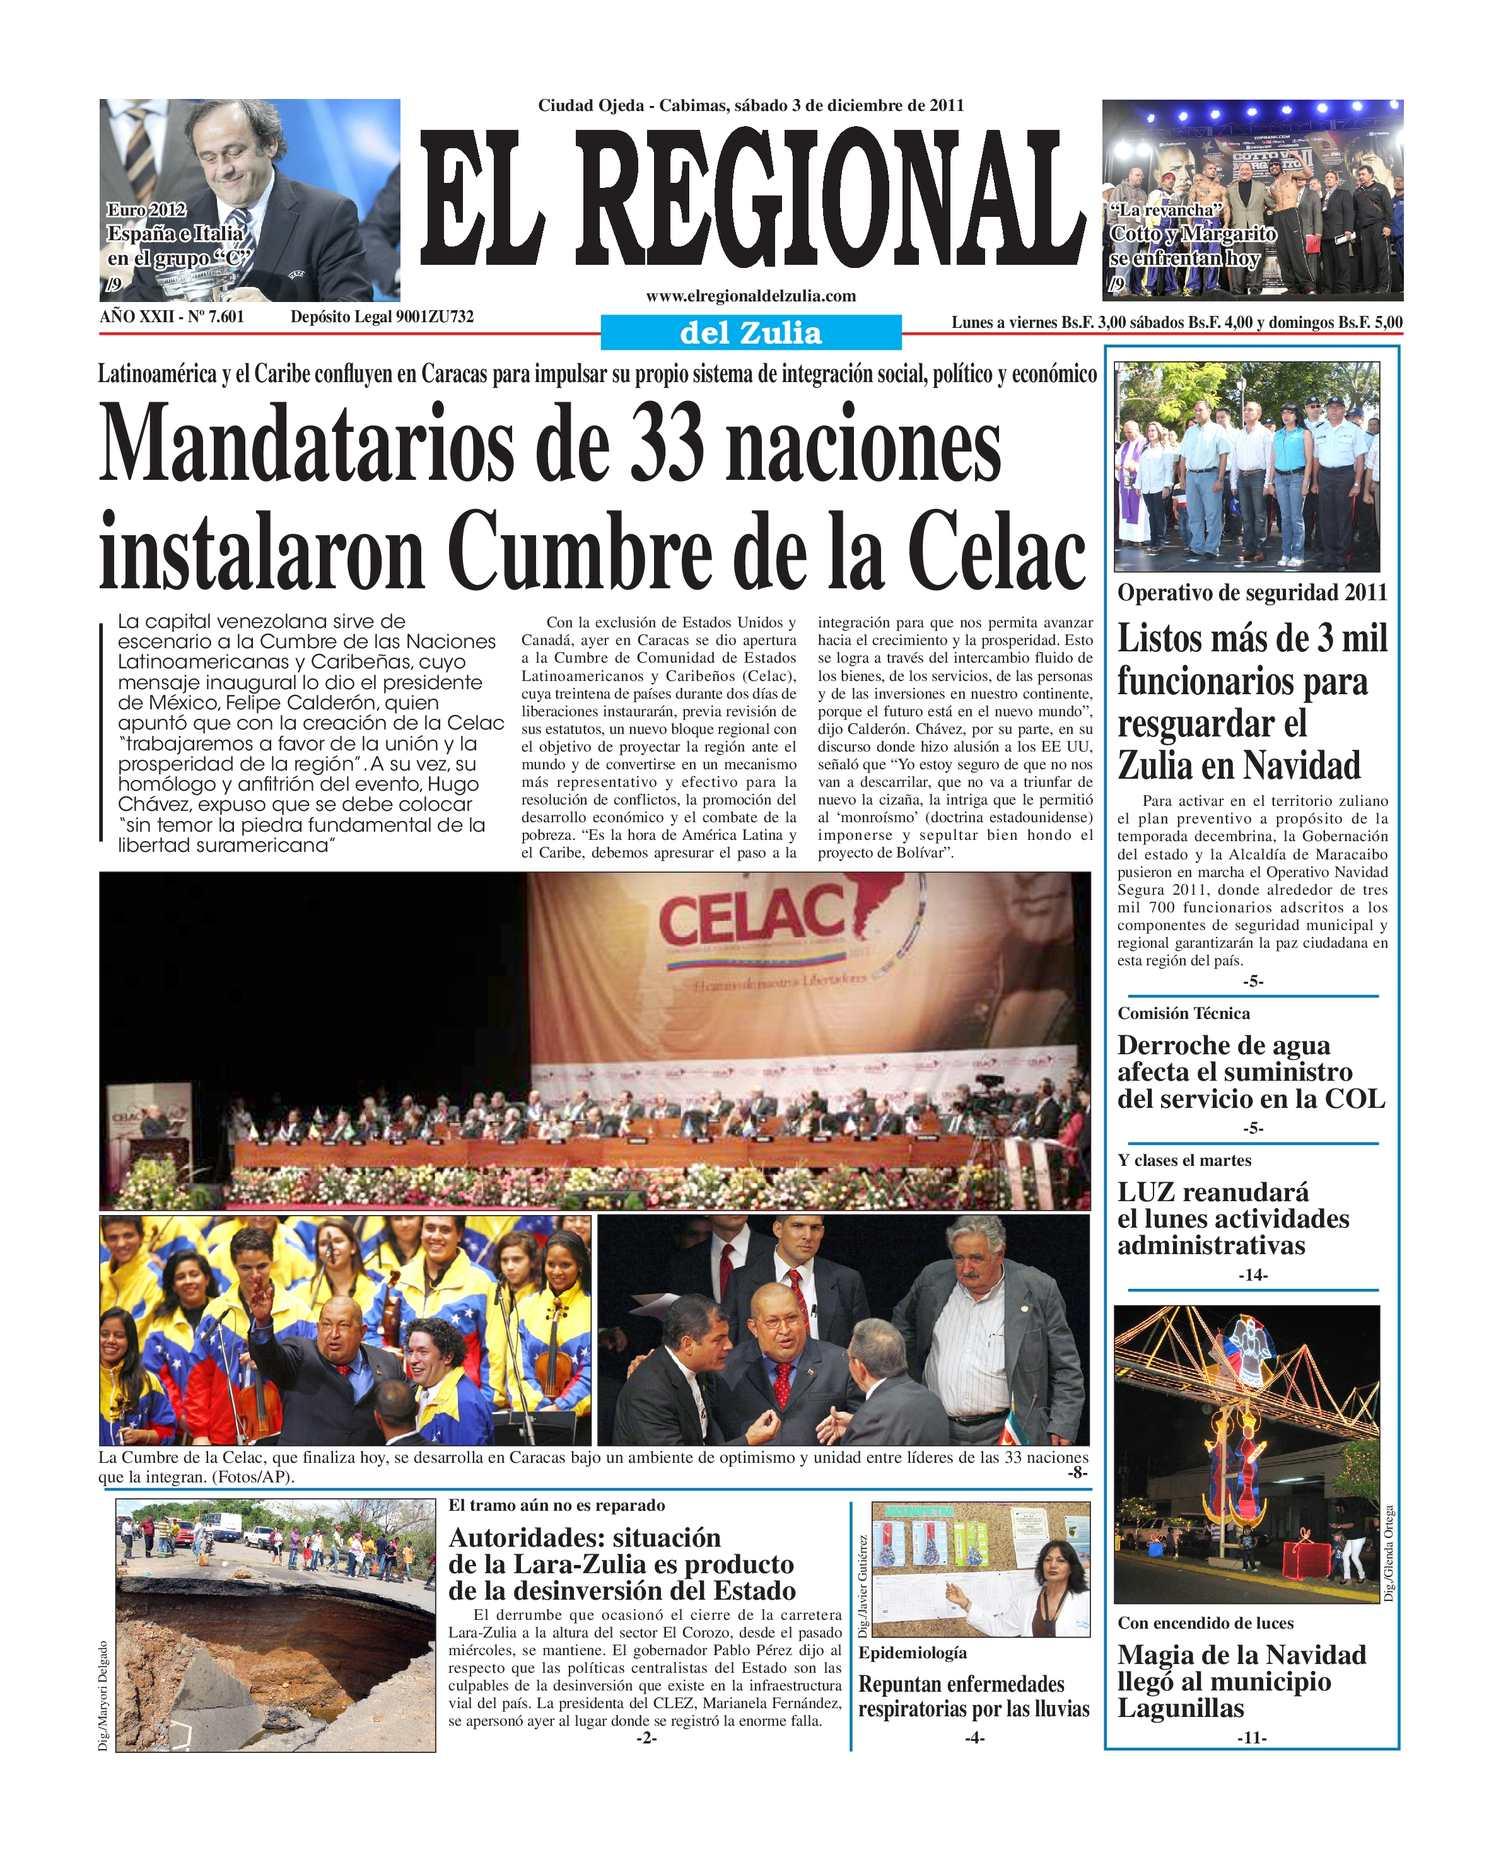 Calaméo - El Regional del Zulia 03-12-2011